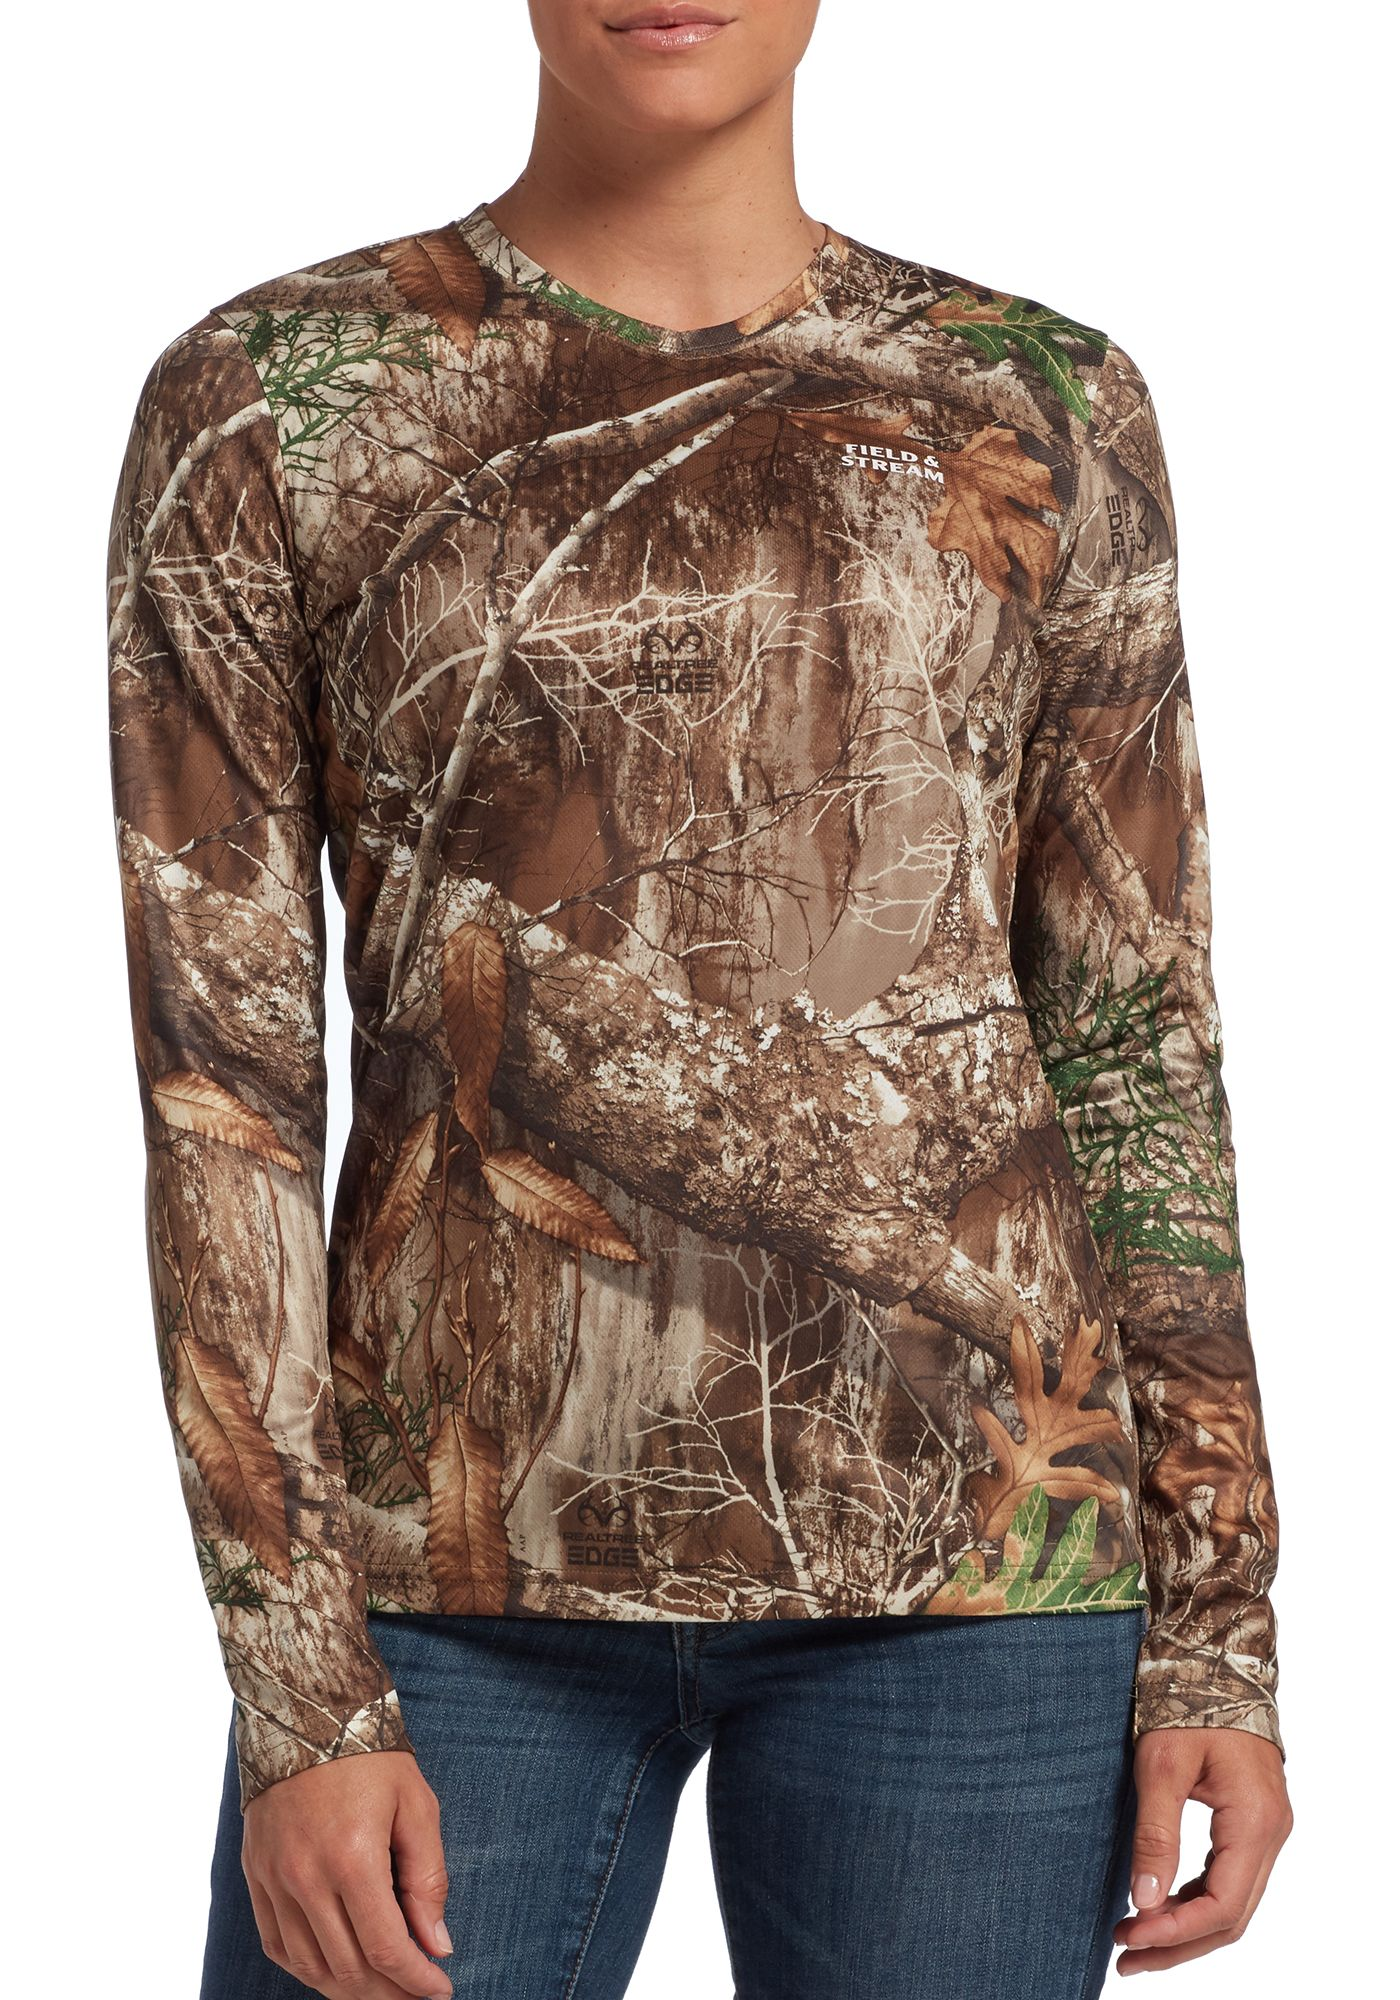 Field & Stream Women's Long Sleeve Performance Tech Hunting T-Shirt